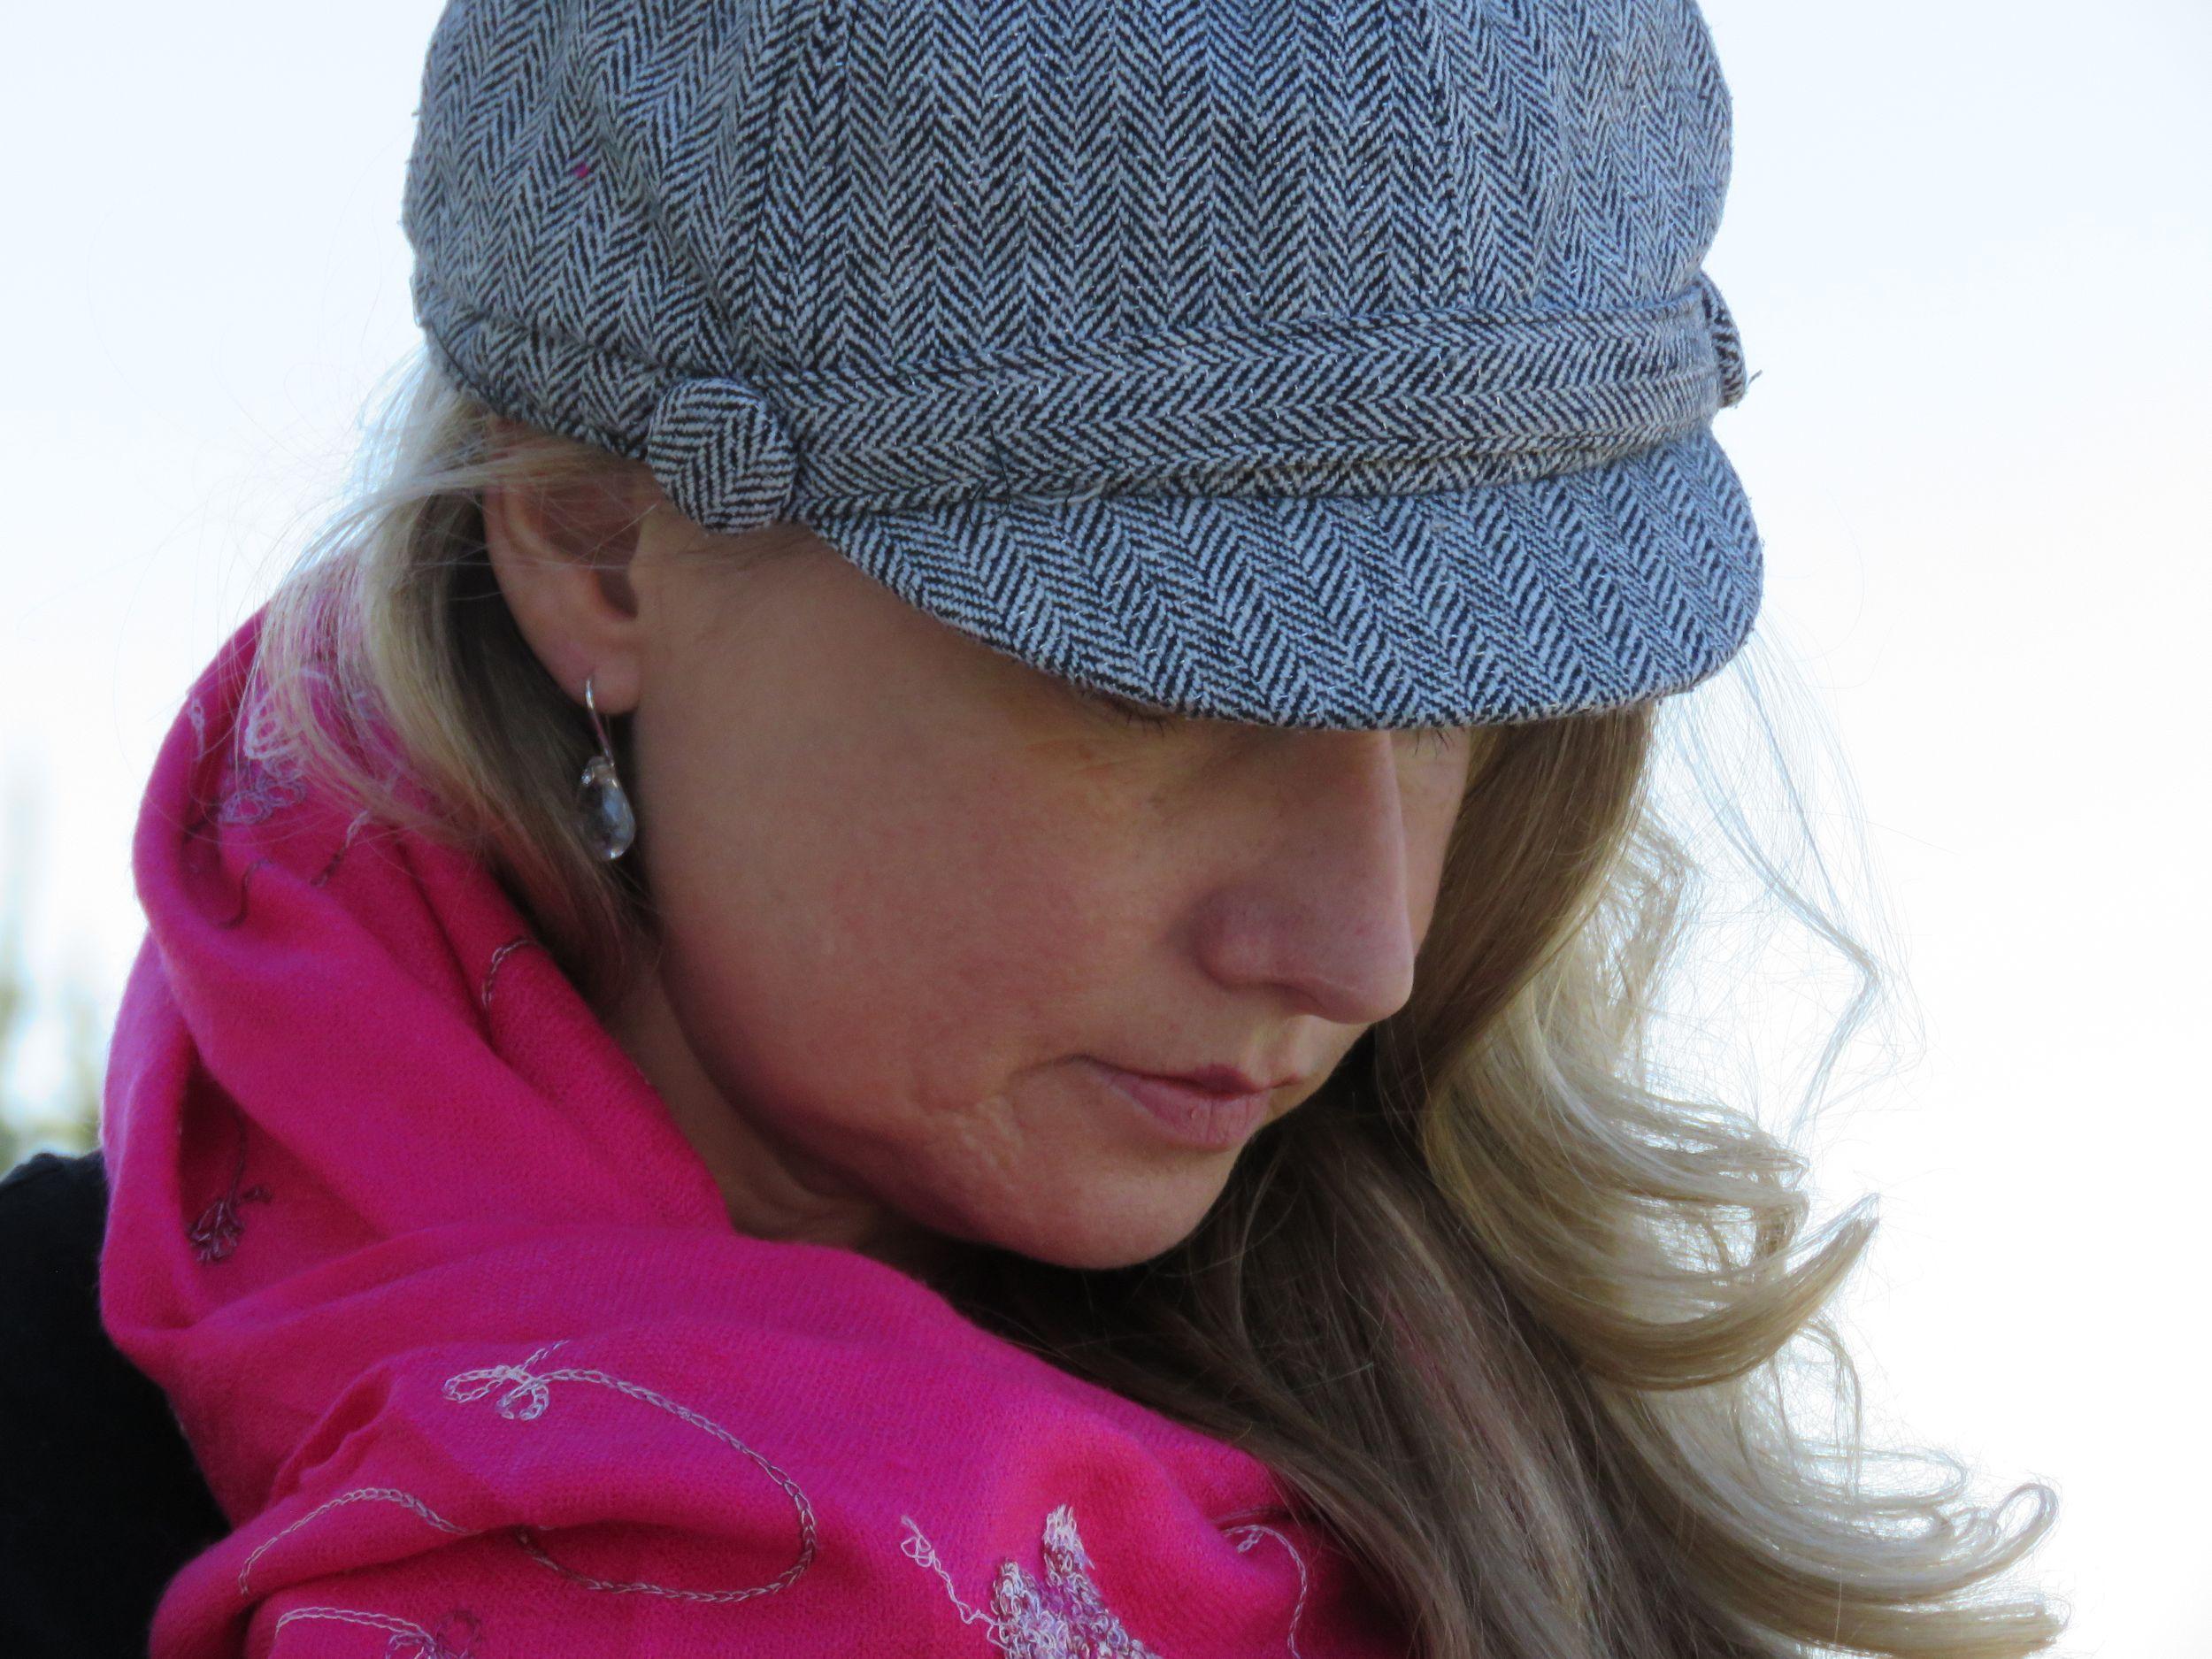 daily-inspired-life-story-karletta-marie